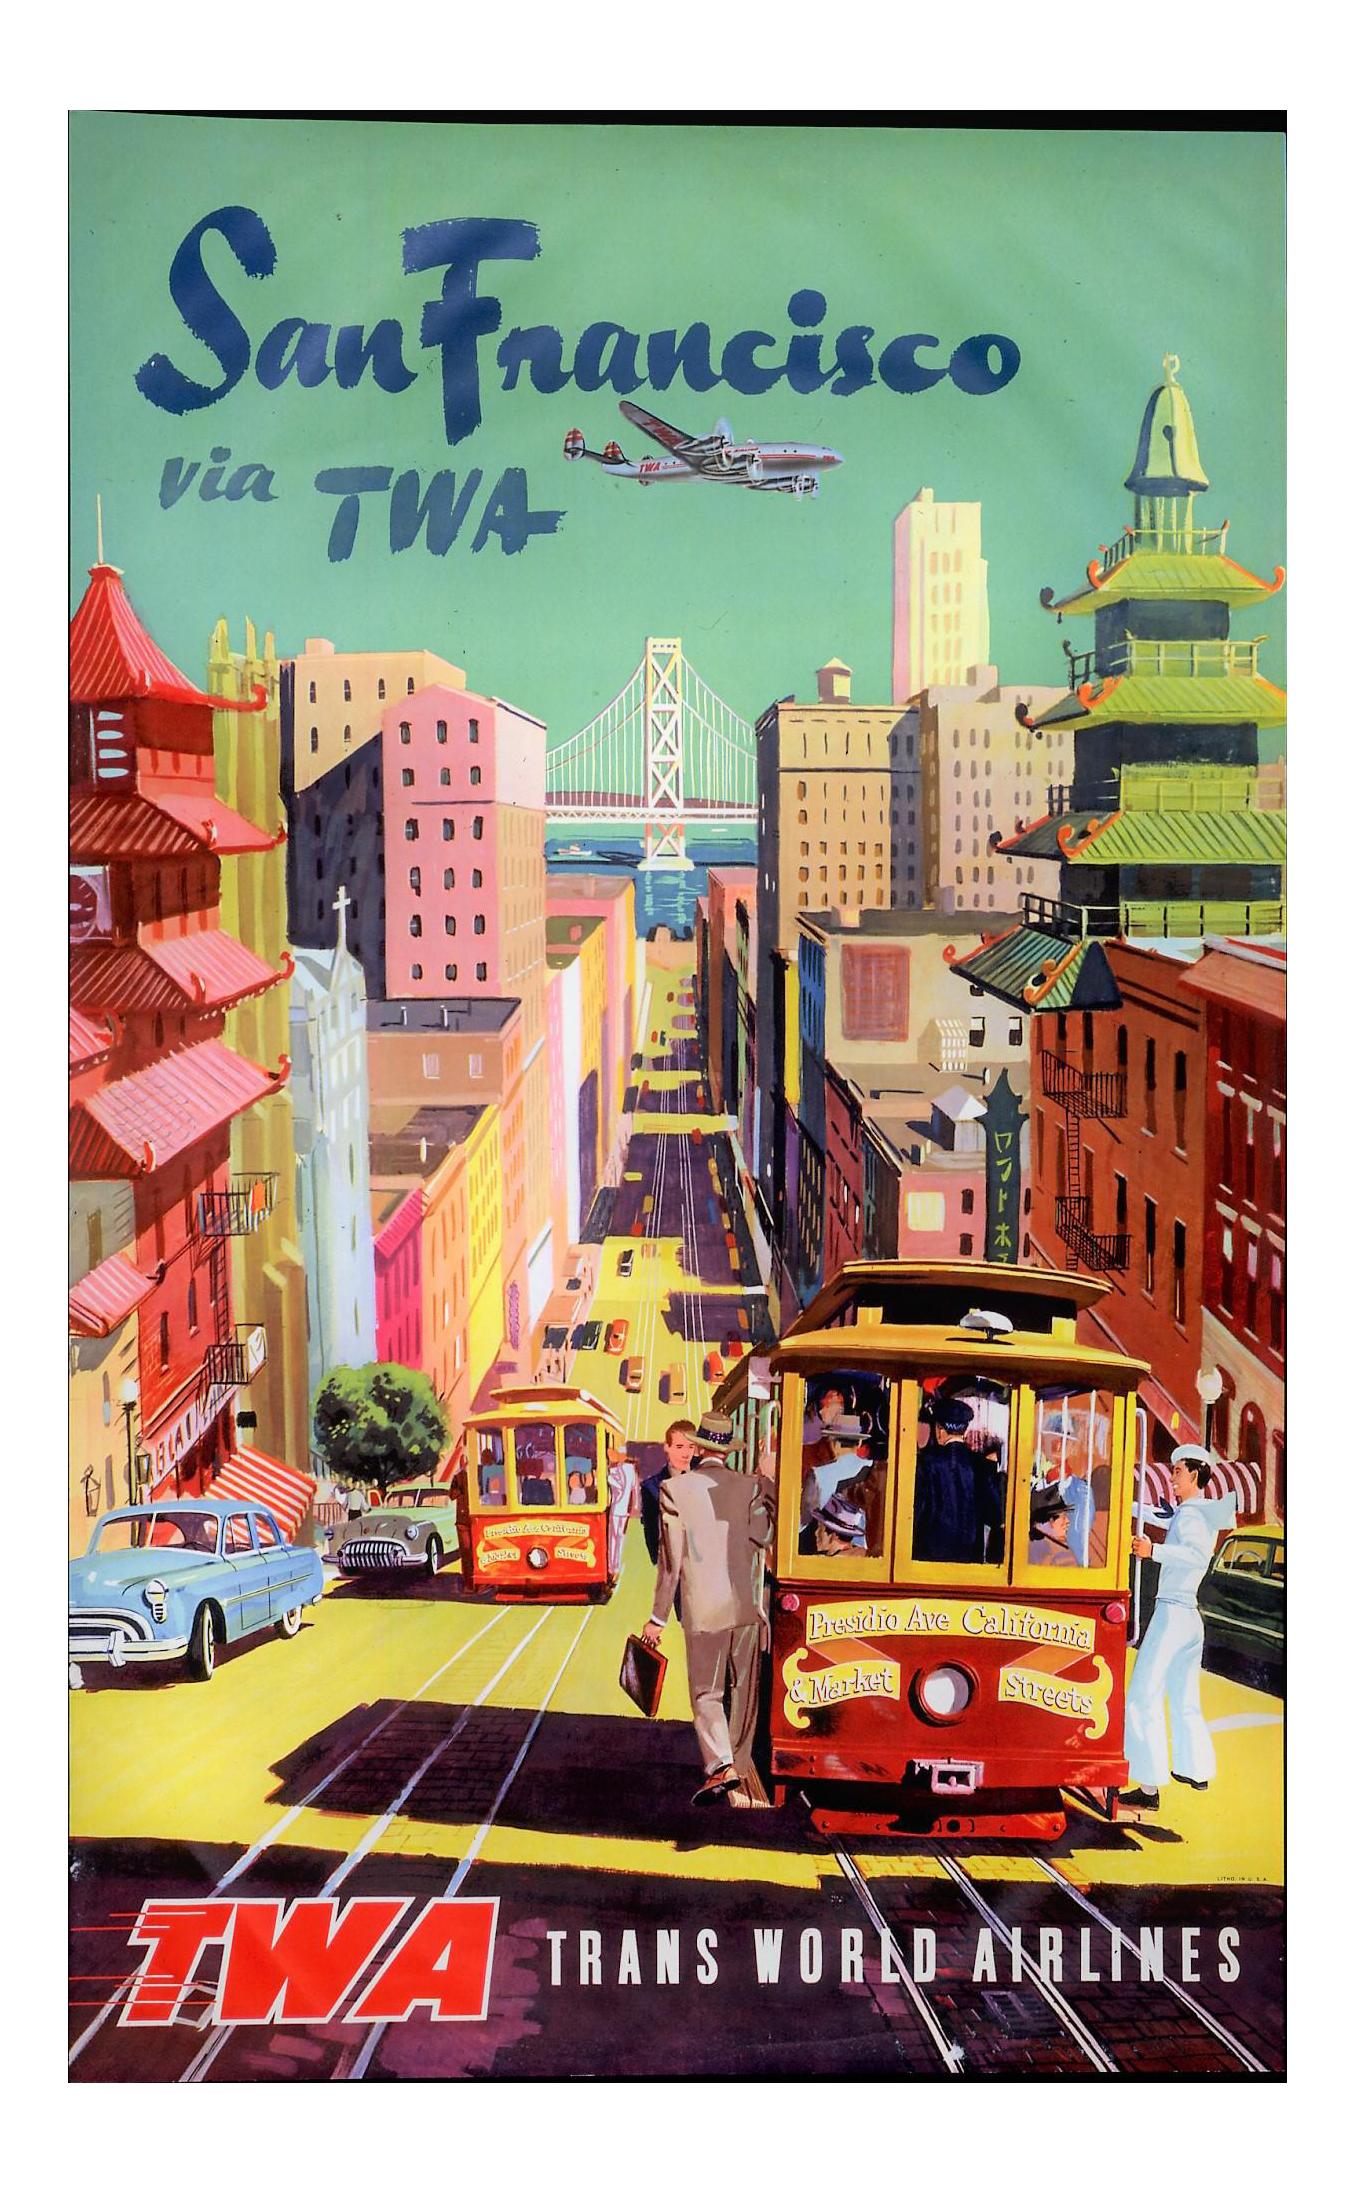 Wonderful Matted And Framed Vintage San Francisco Travel Poster   Image 1 Of 3